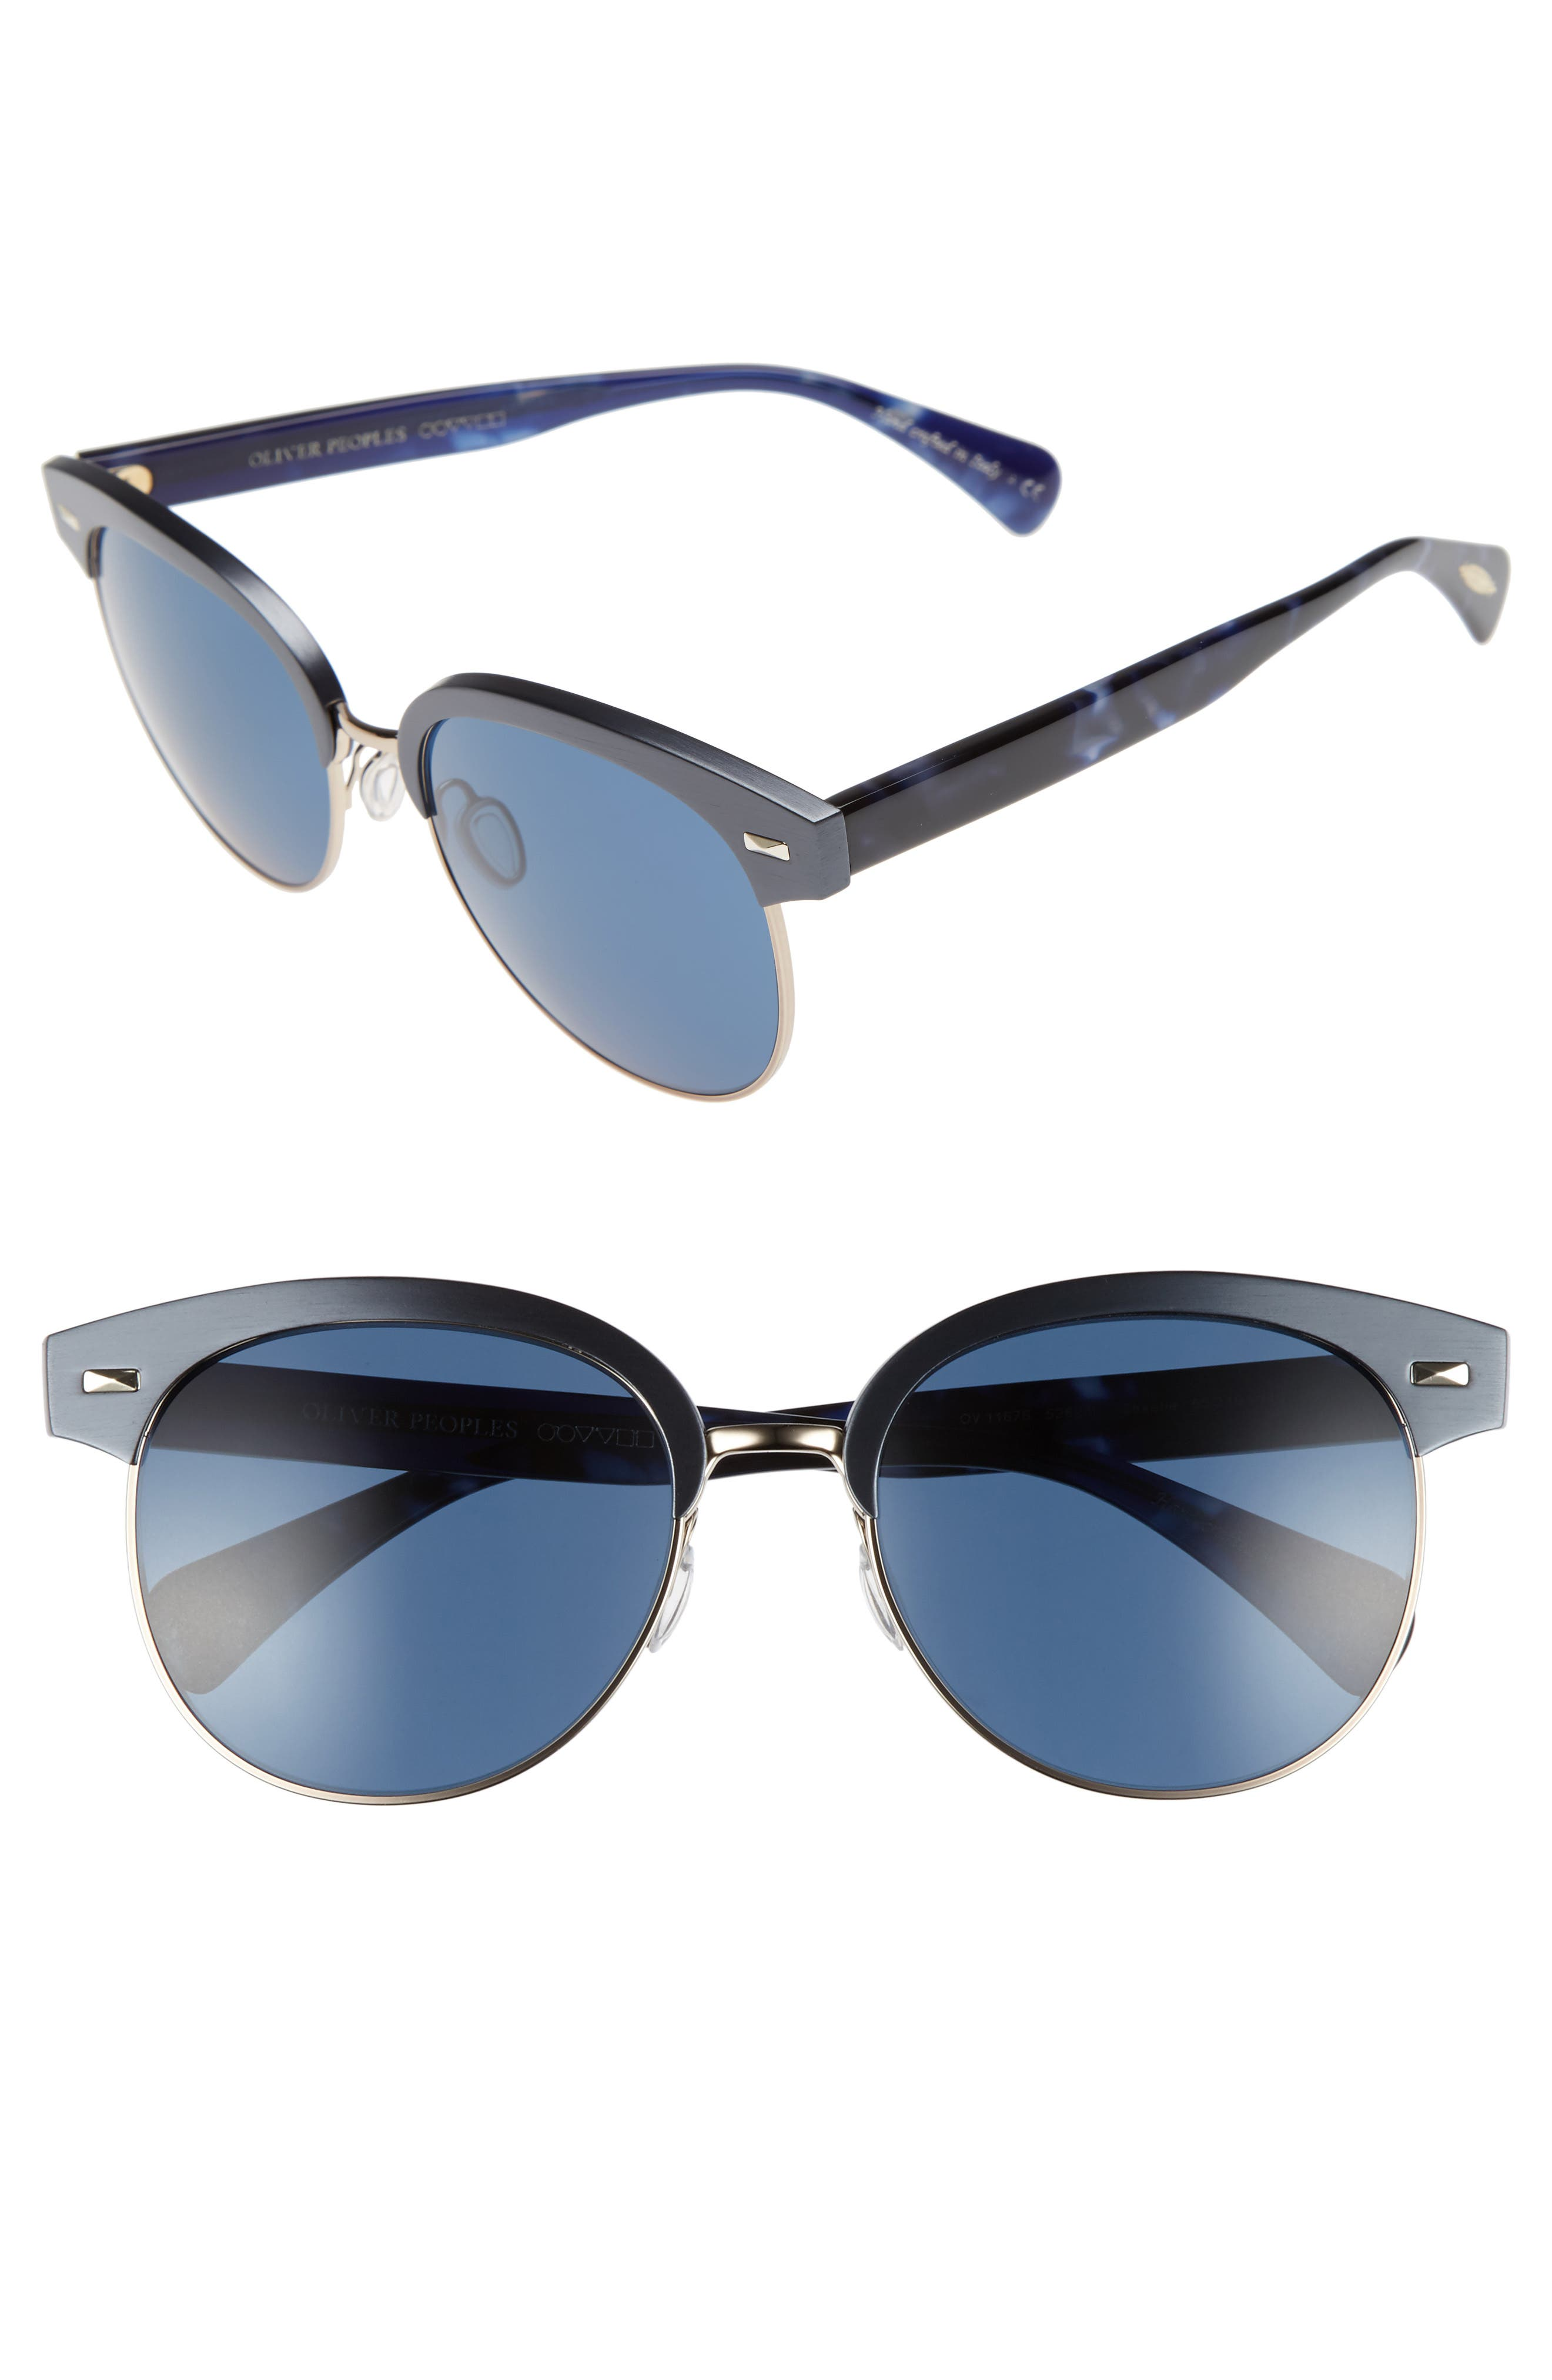 Shaelie 55mm Mirrored Semi-Rim Sunglasses,                         Main,                         color, Navy